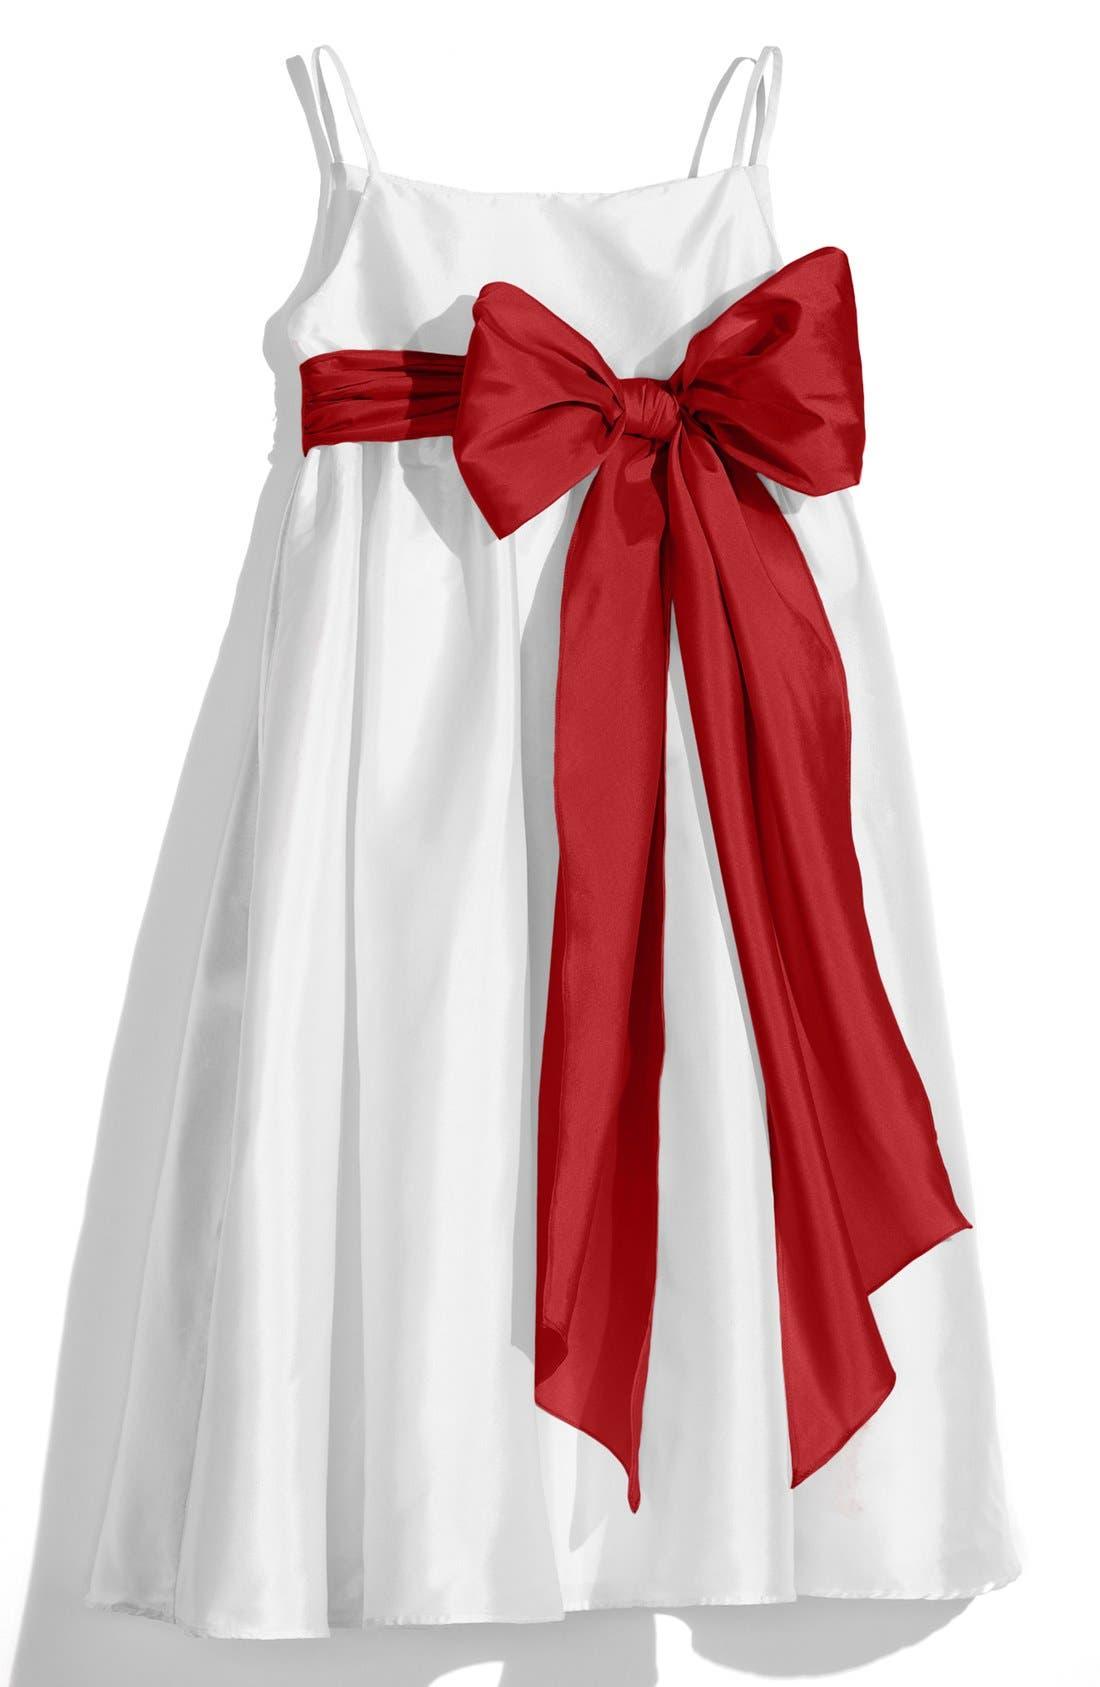 White Sleeveless Empire Waist Taffeta Dress,                             Main thumbnail 1, color,                             White/ Rouge